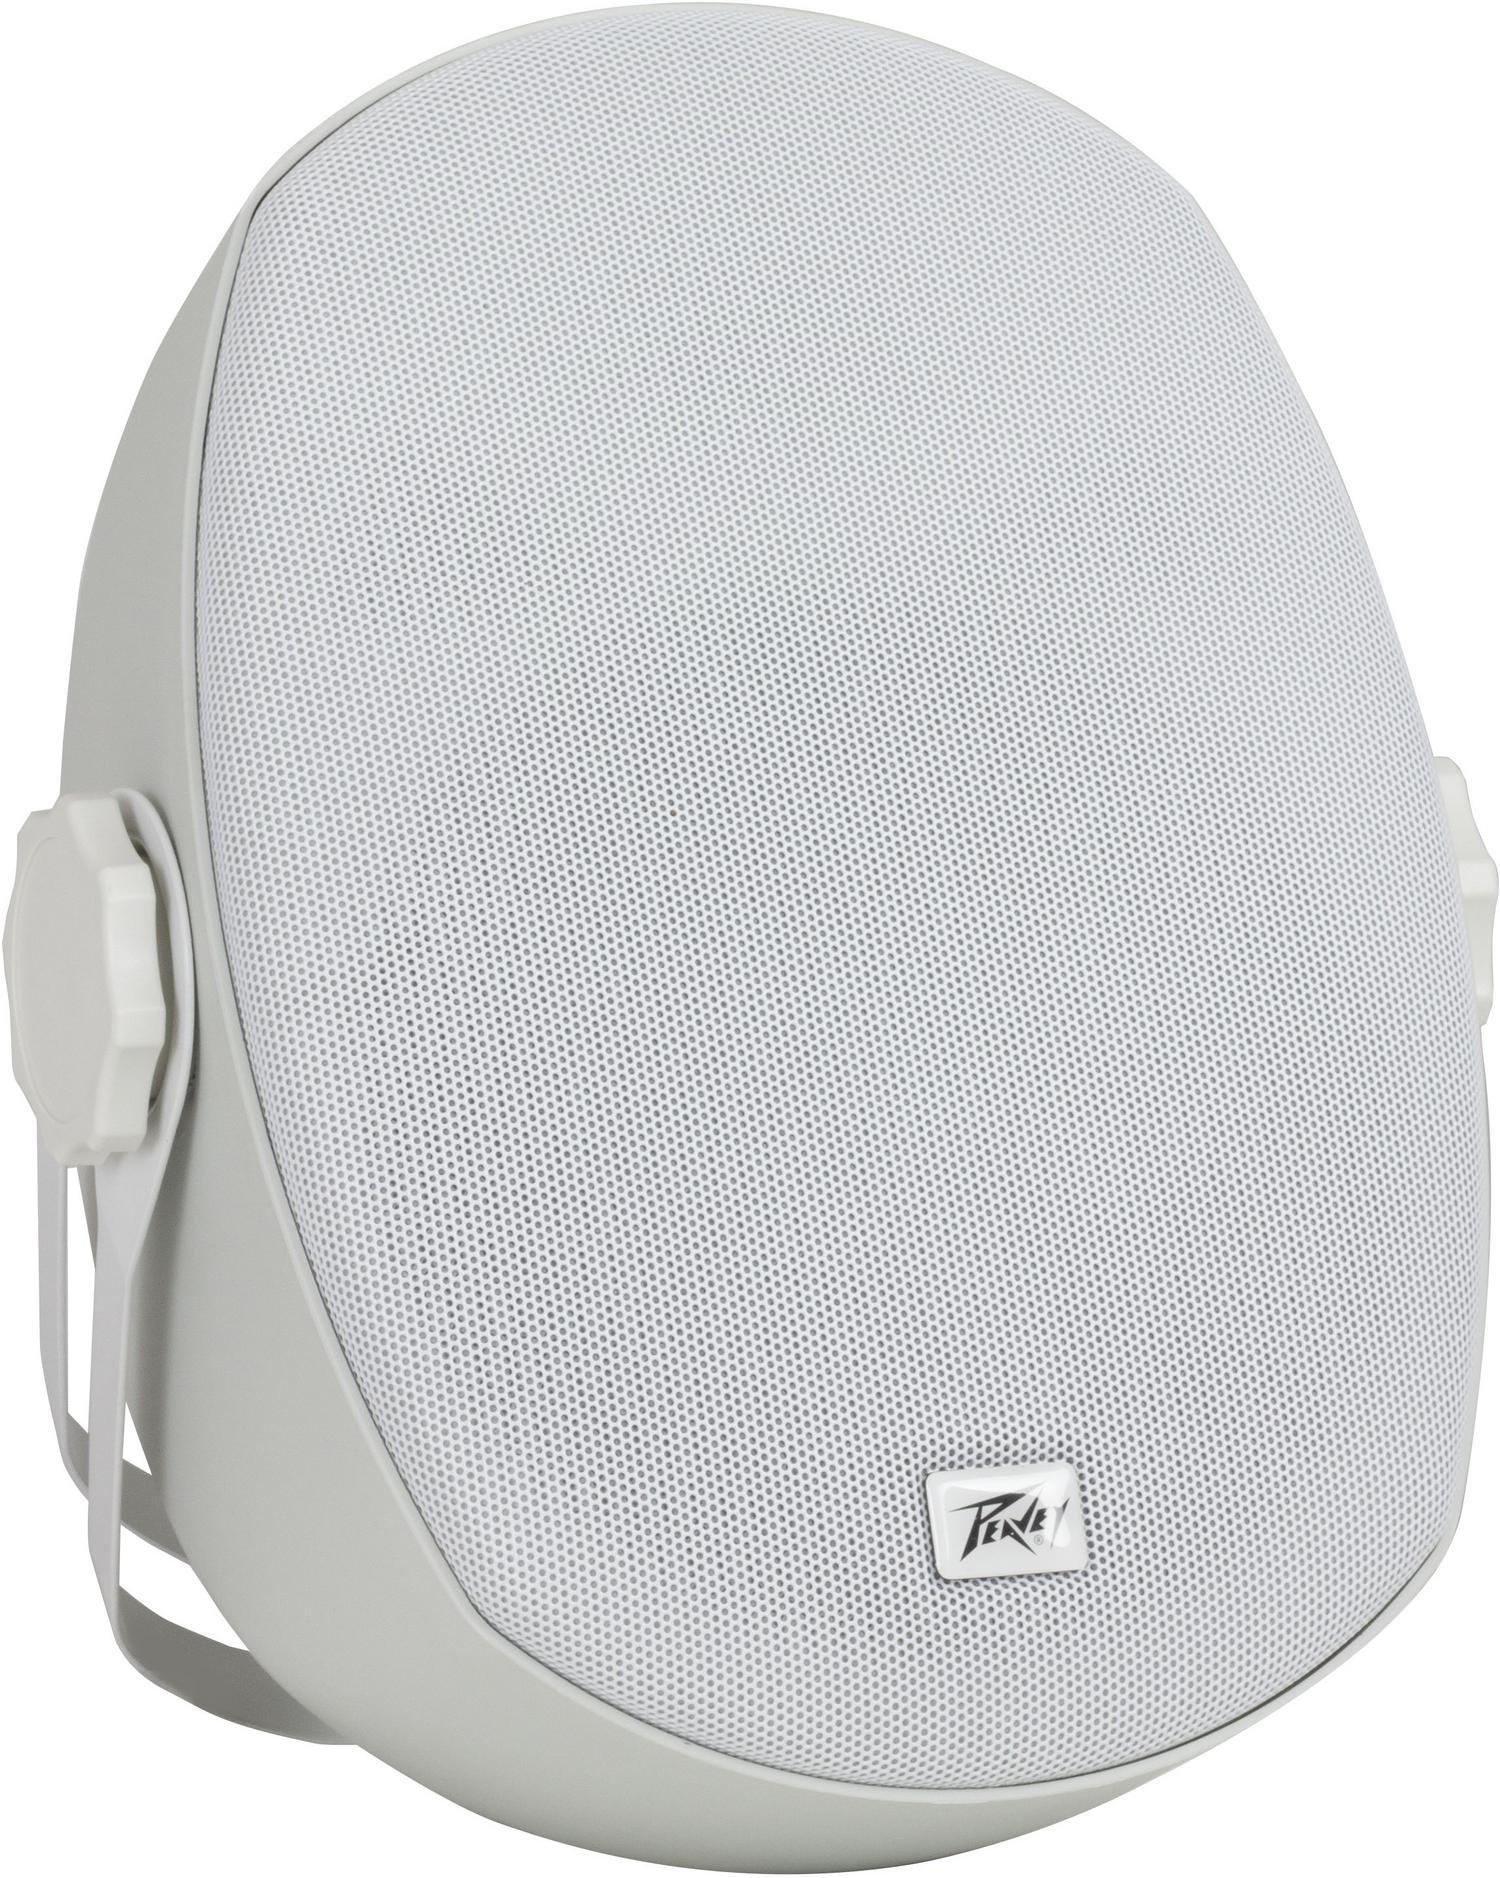 Peavey Impulse 8c - White, 8'' (03616730) by Peavey